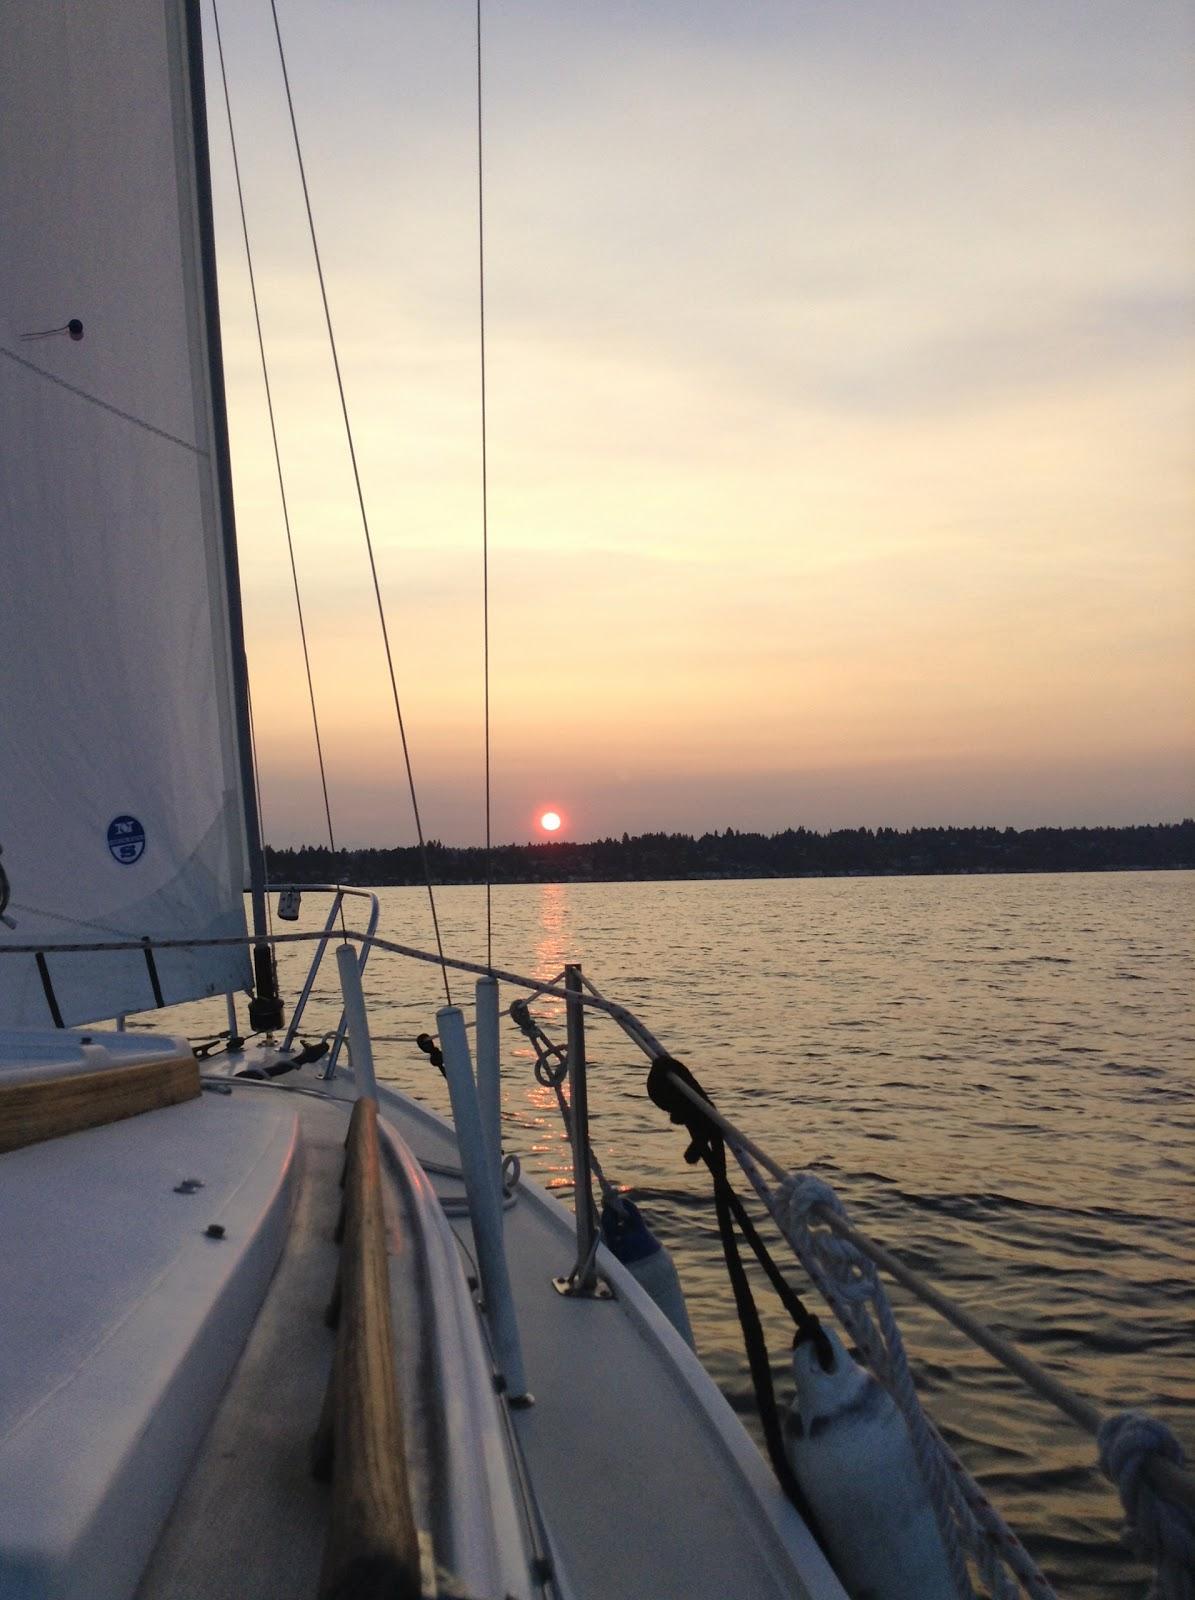 Fantasia at sunset